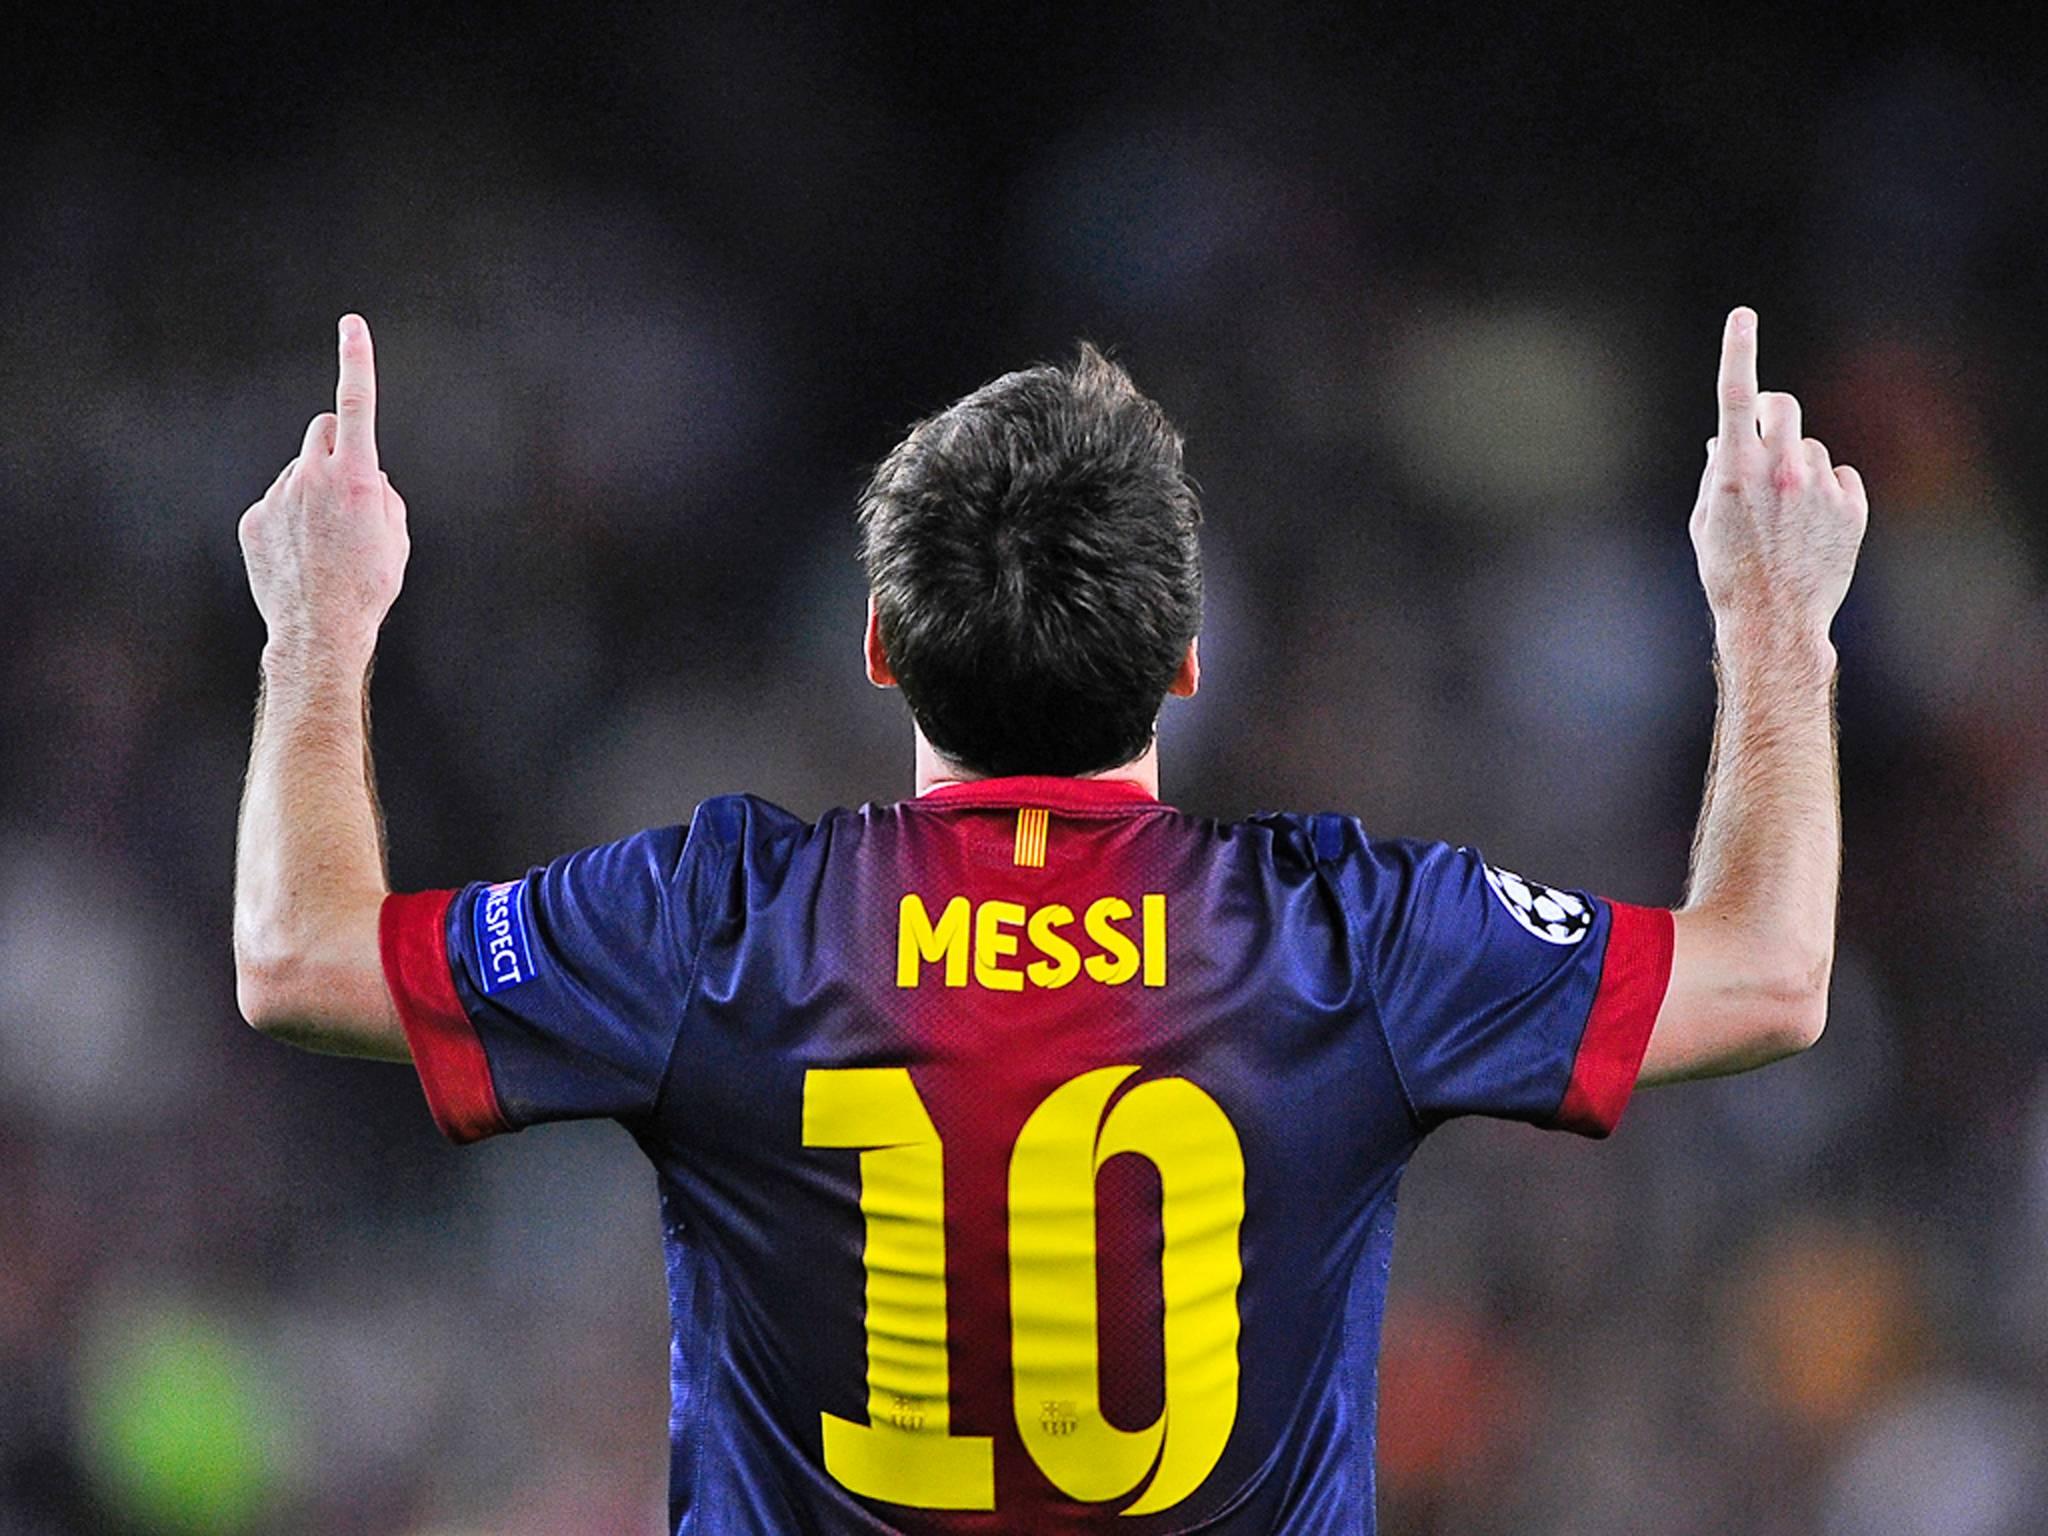 Download Lionel Messi 10 Celebration Wallpaper 12193 Wallpaper 2048x1536